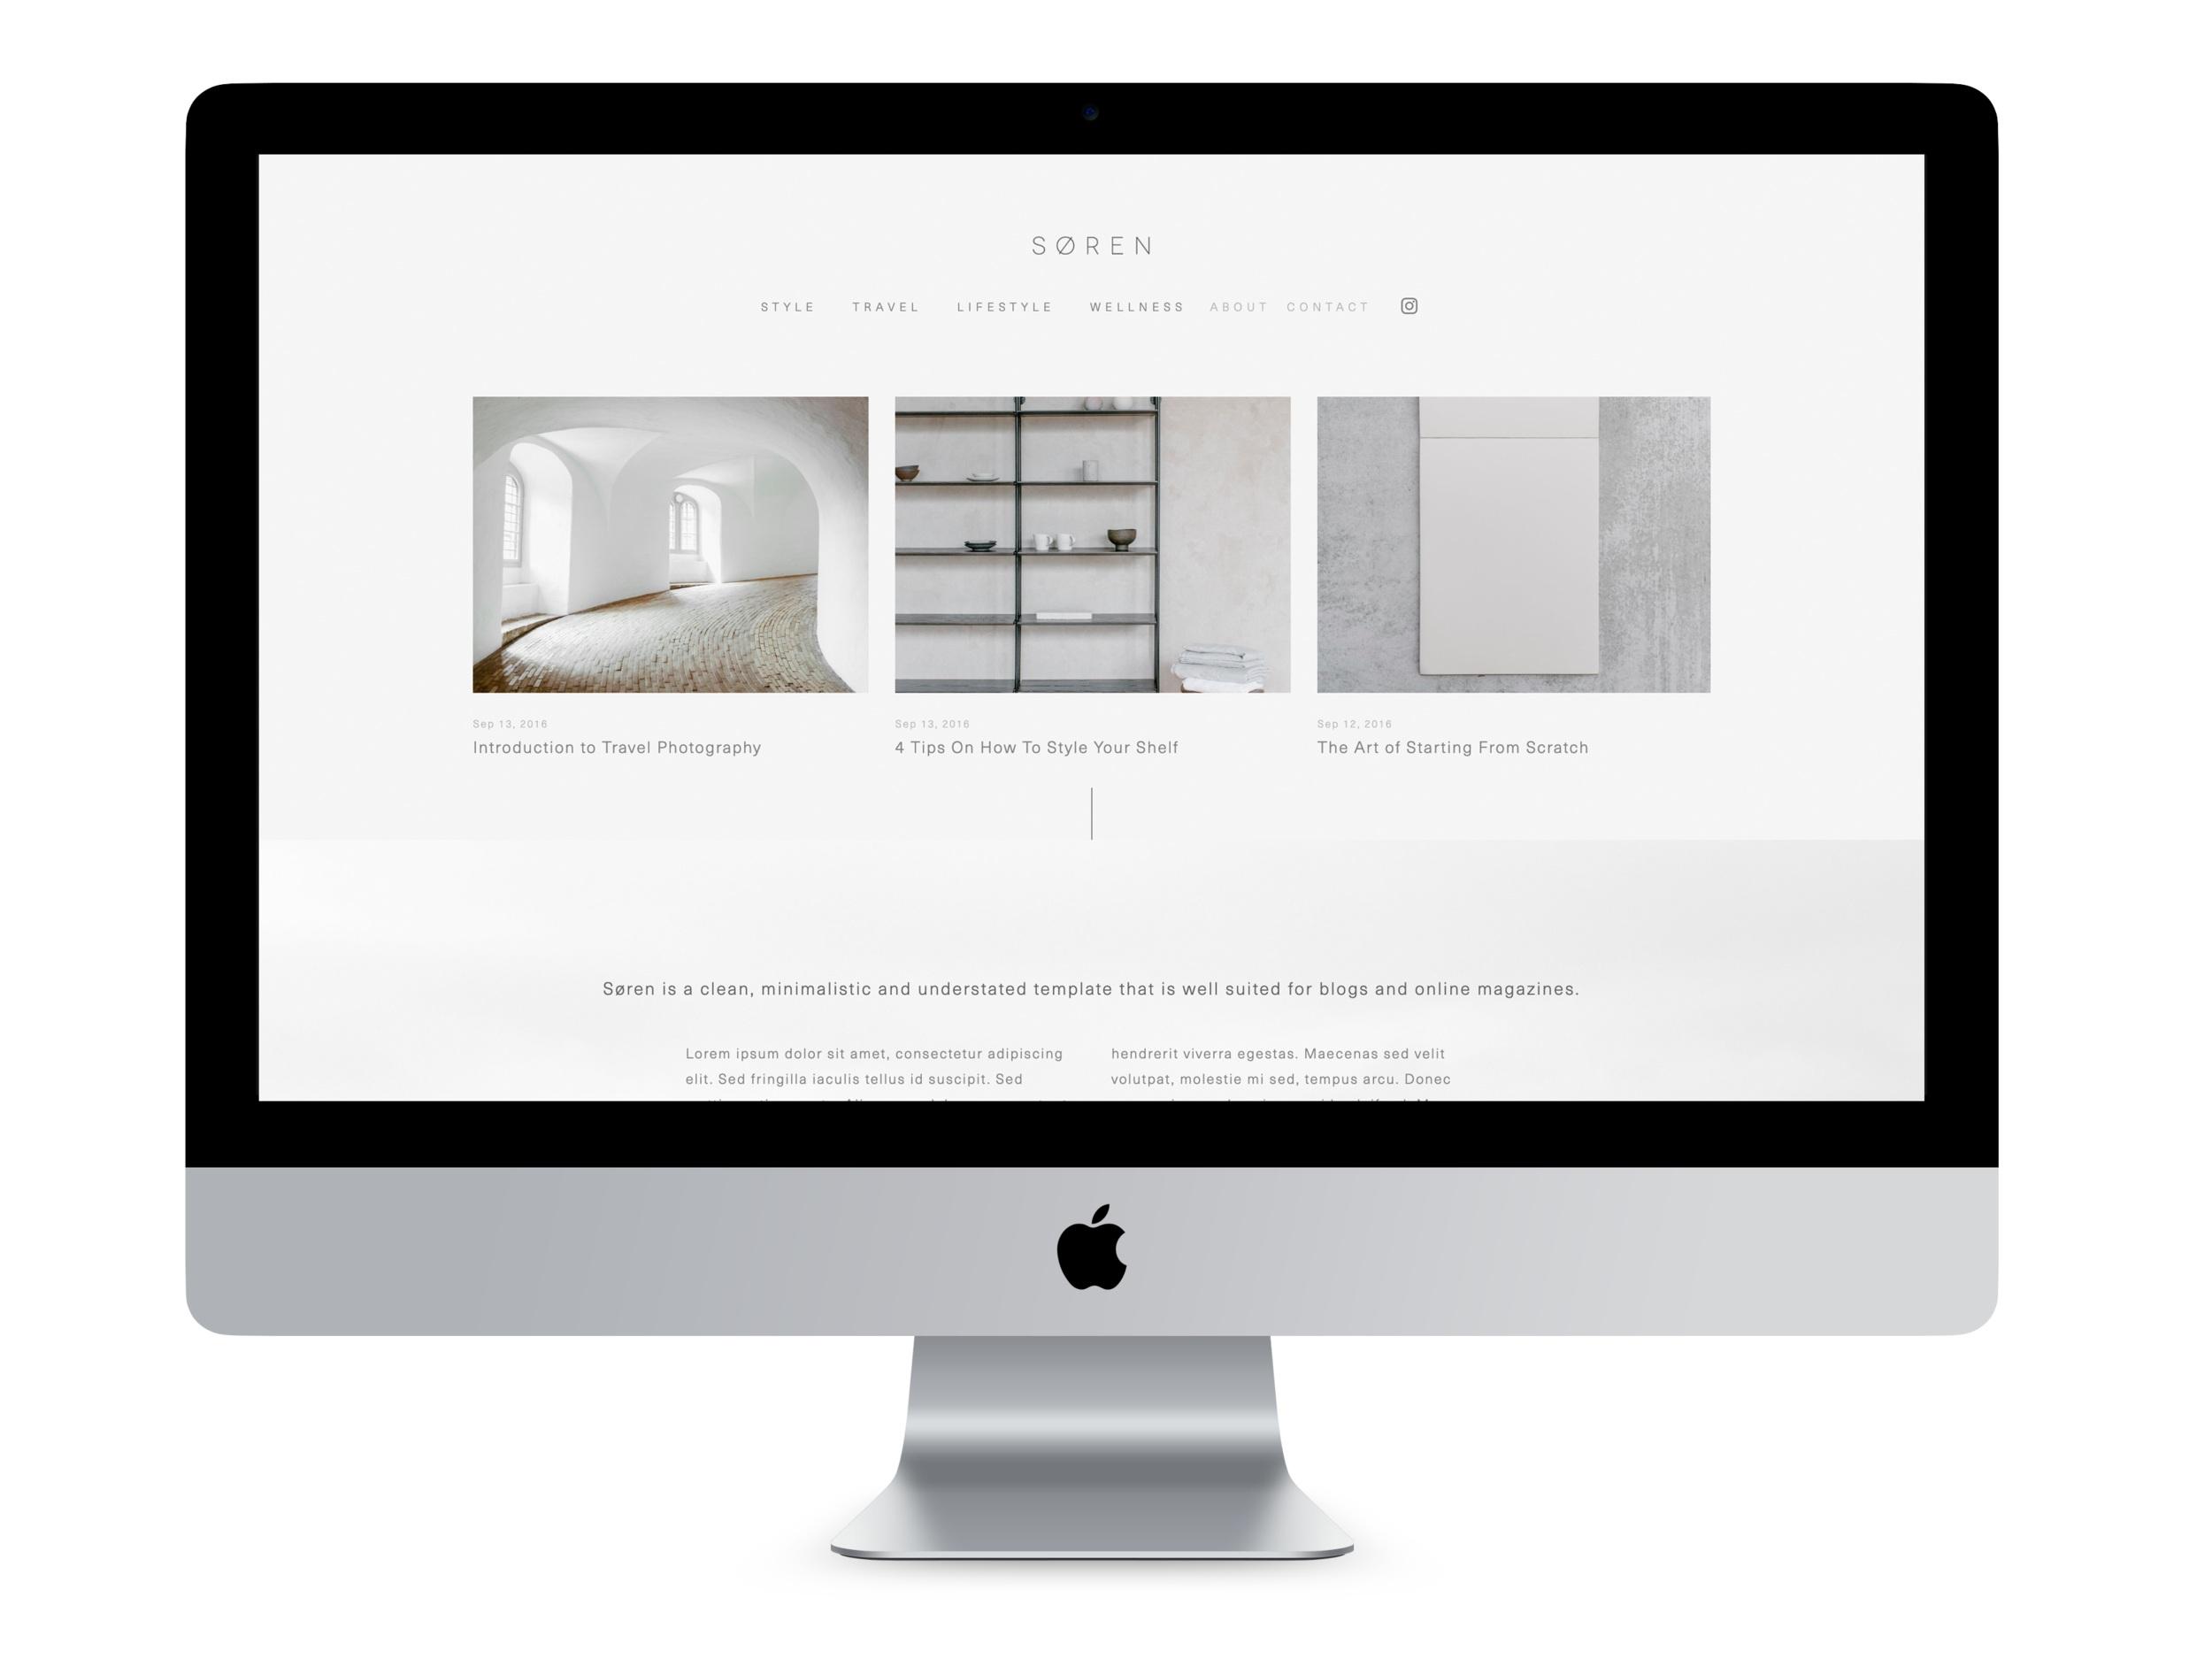 SorenDesktop.jpg